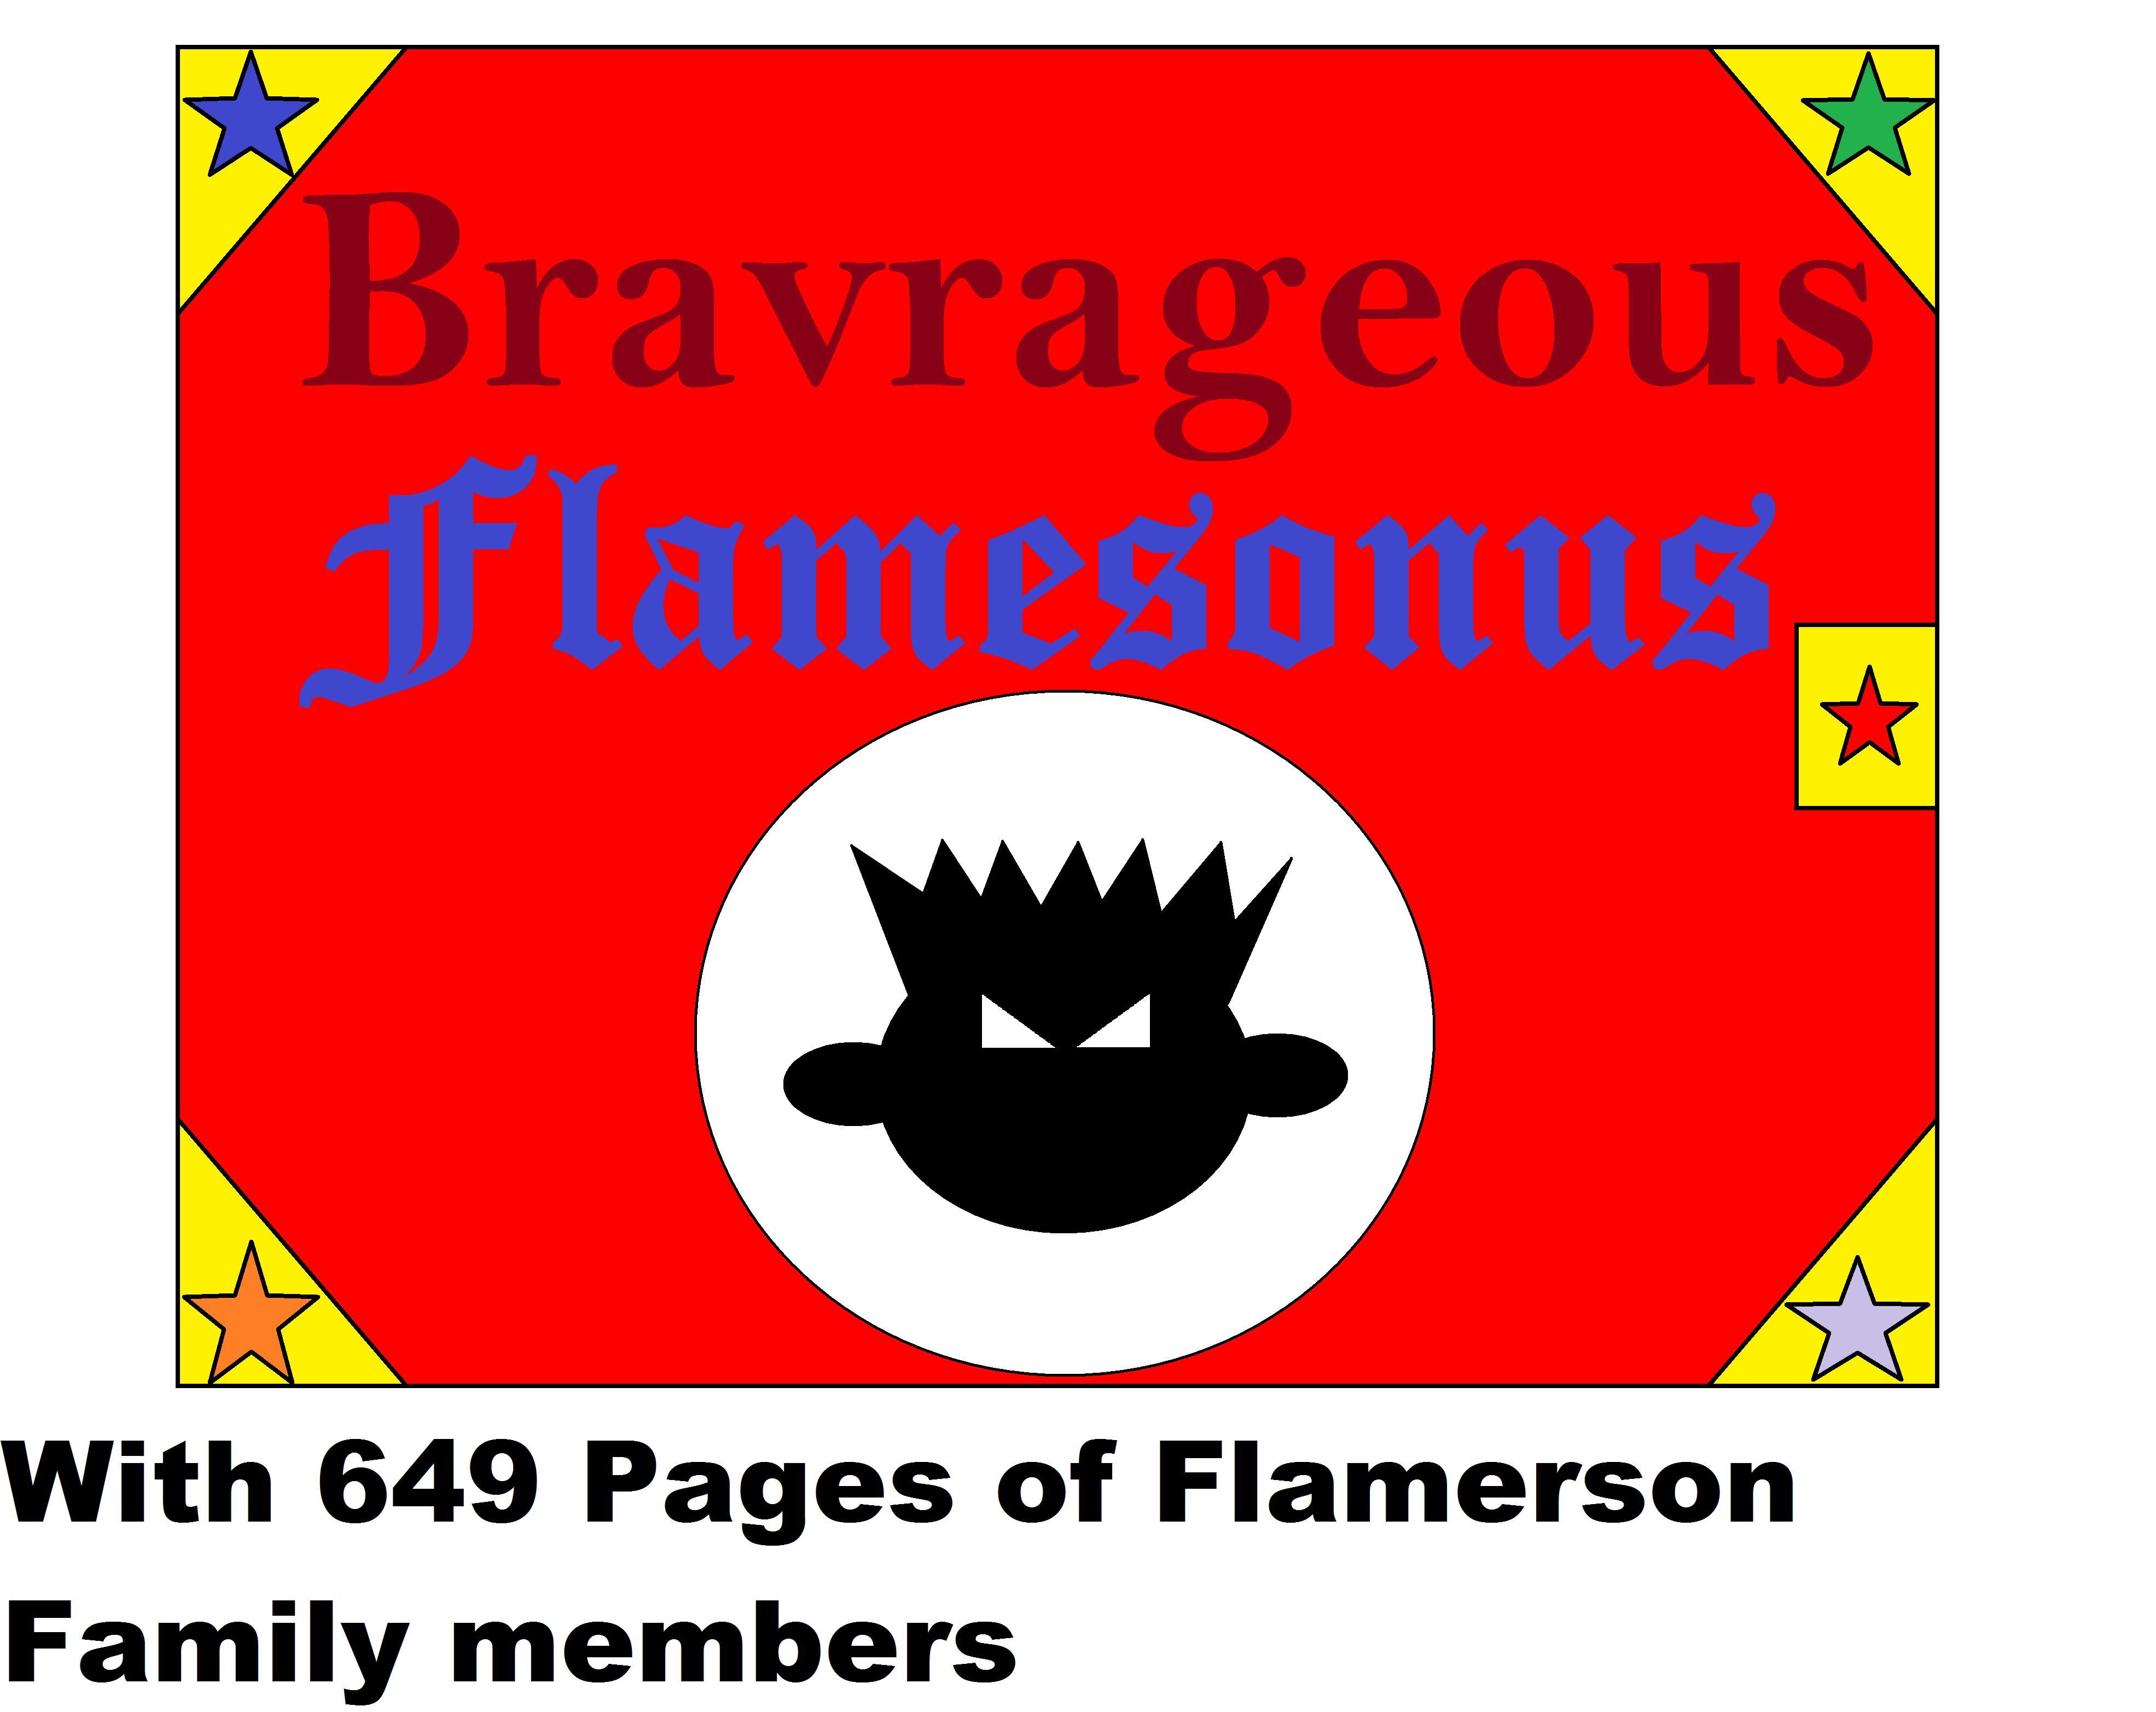 Bravrageous Flamesonus by Flame-dragon